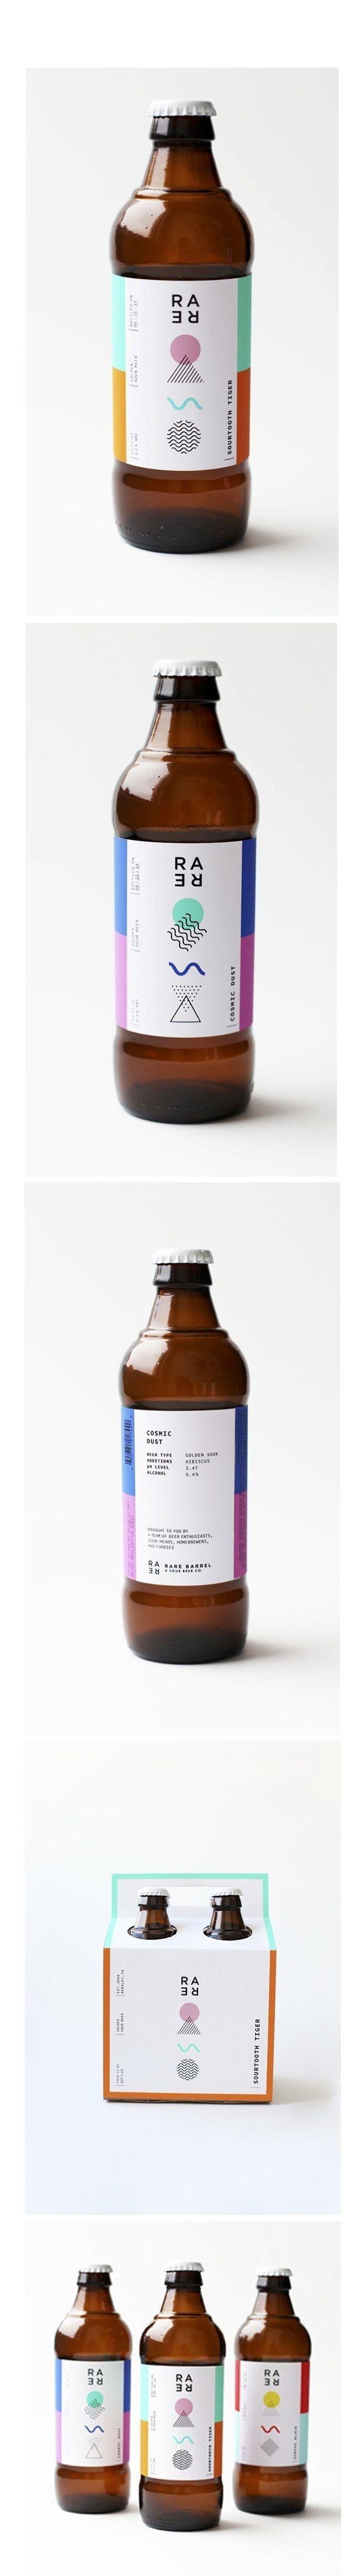 Rare Barrel Beer Packaging (Designer Unknown) | Fivestar Branding Agency – Design and Branding Agency & Curated Inspiration Gallery